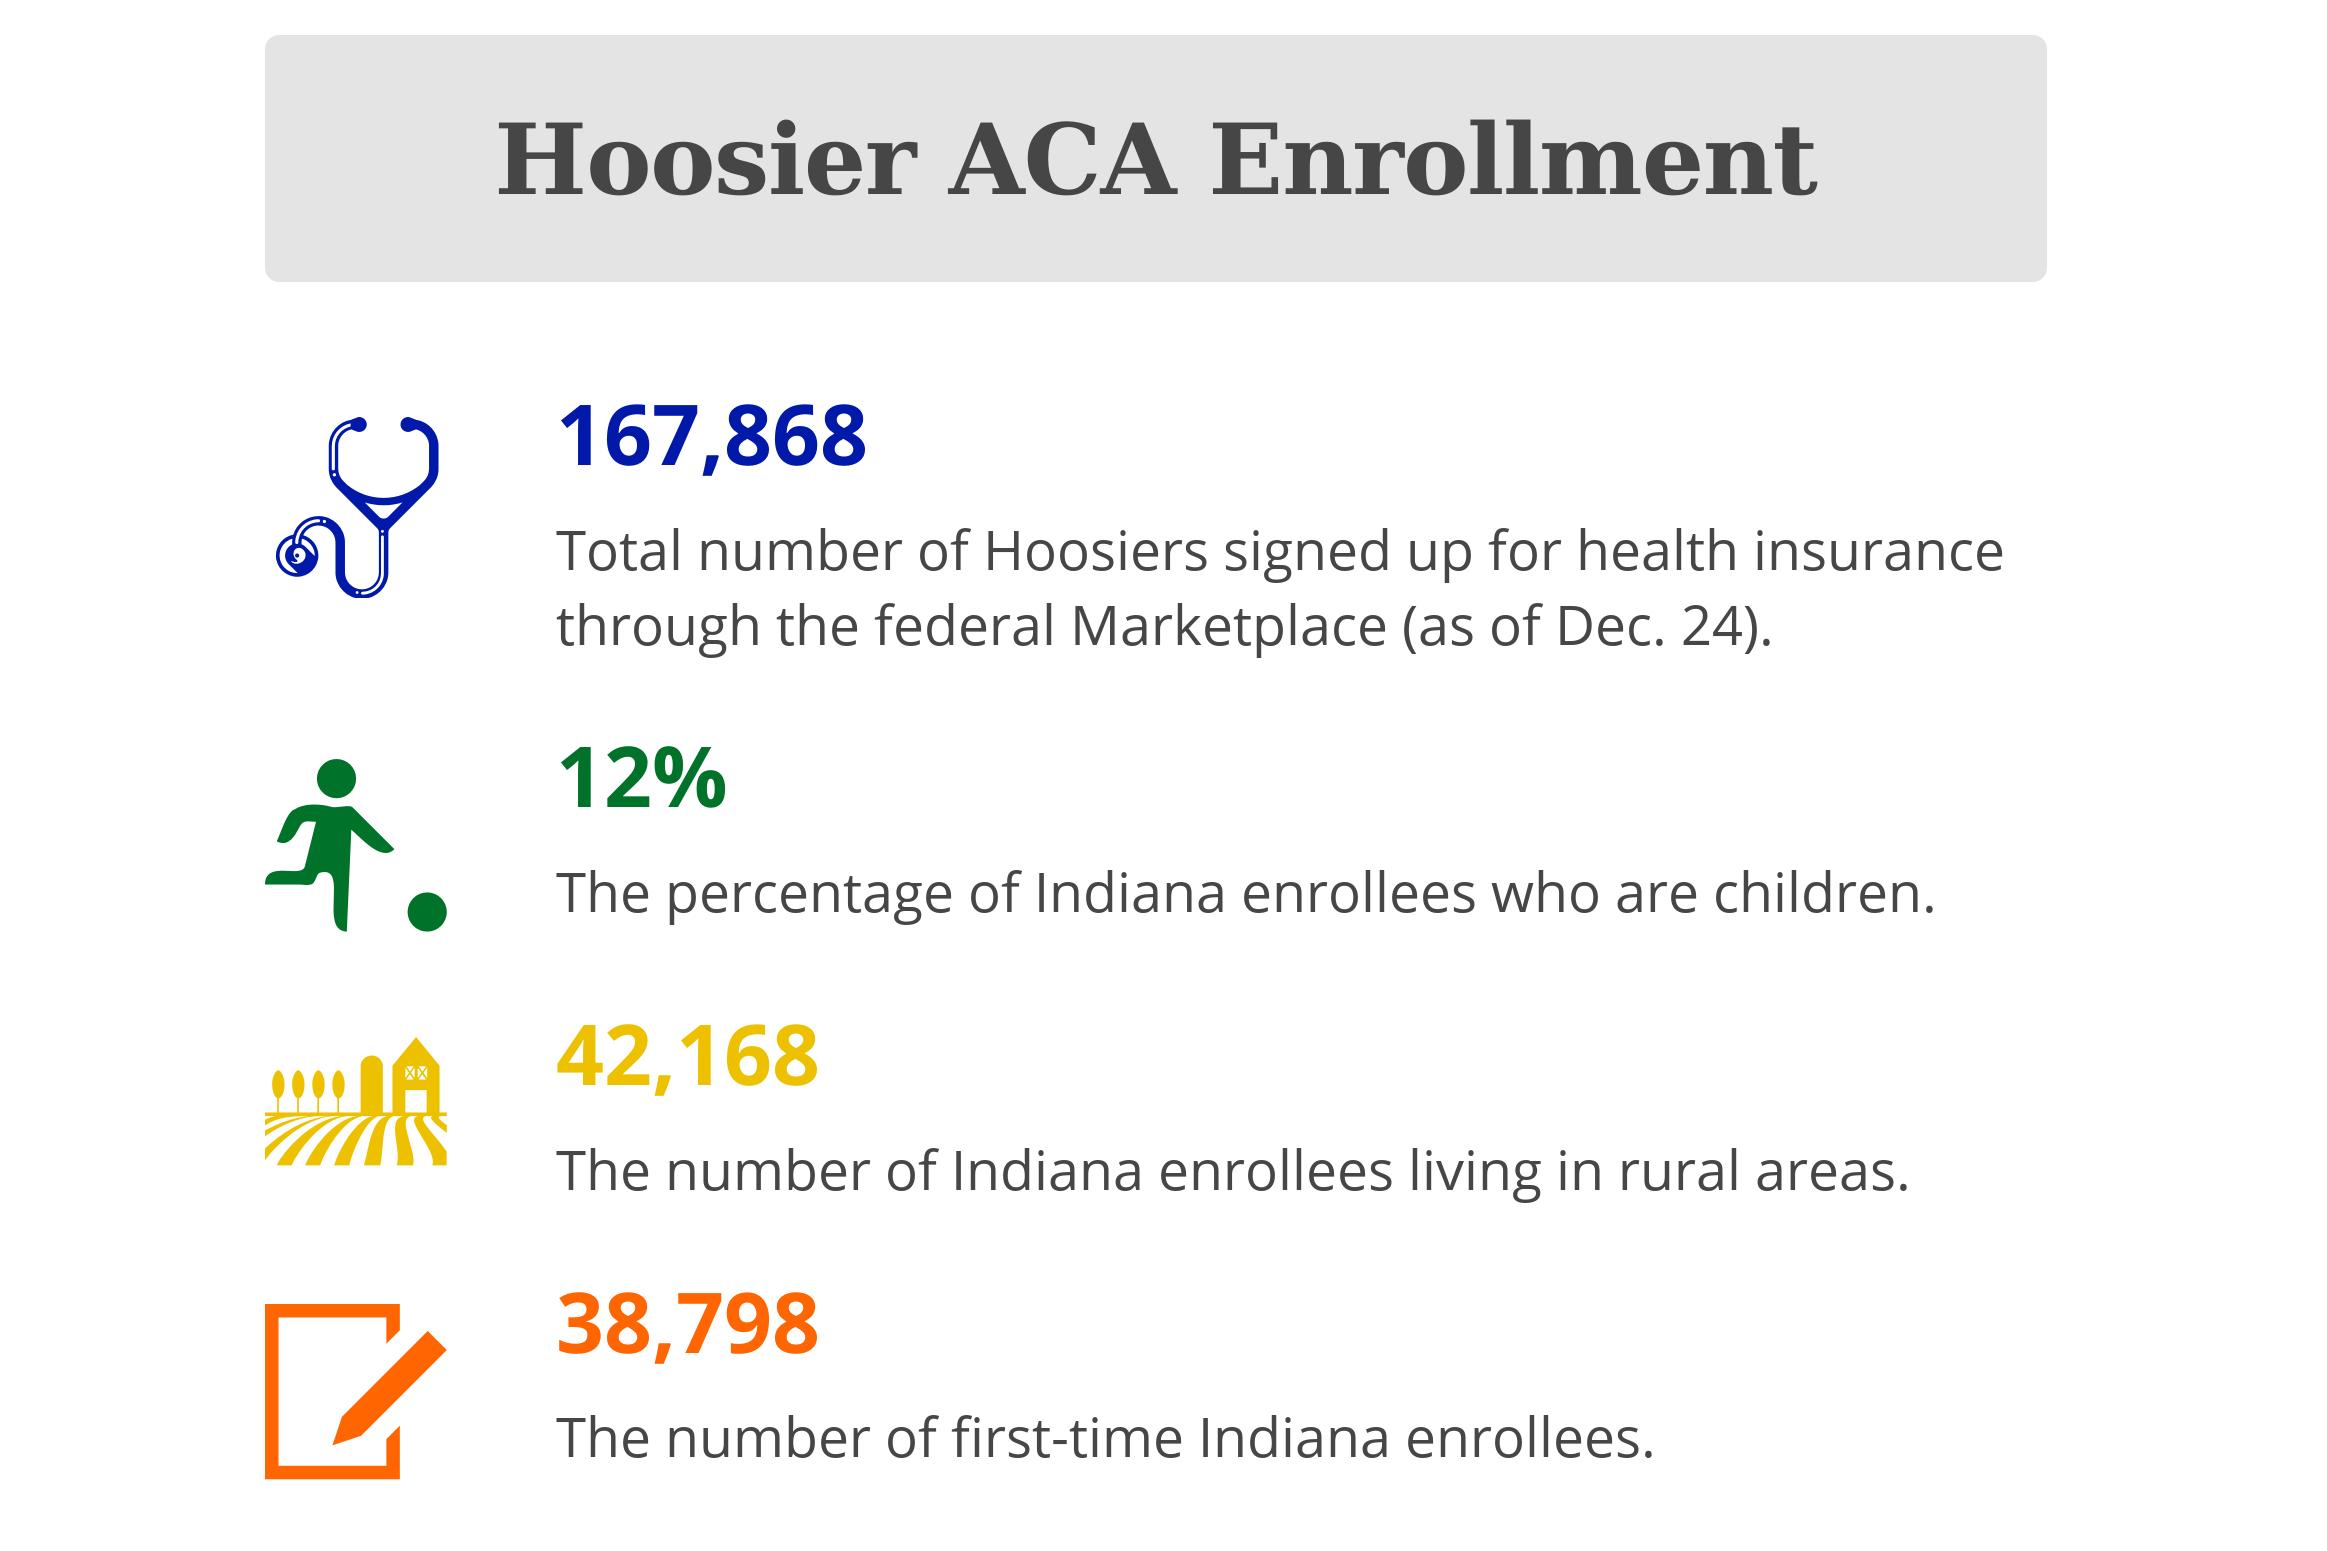 Hoosier ACA enrollment as of Dec. 24, 2016.